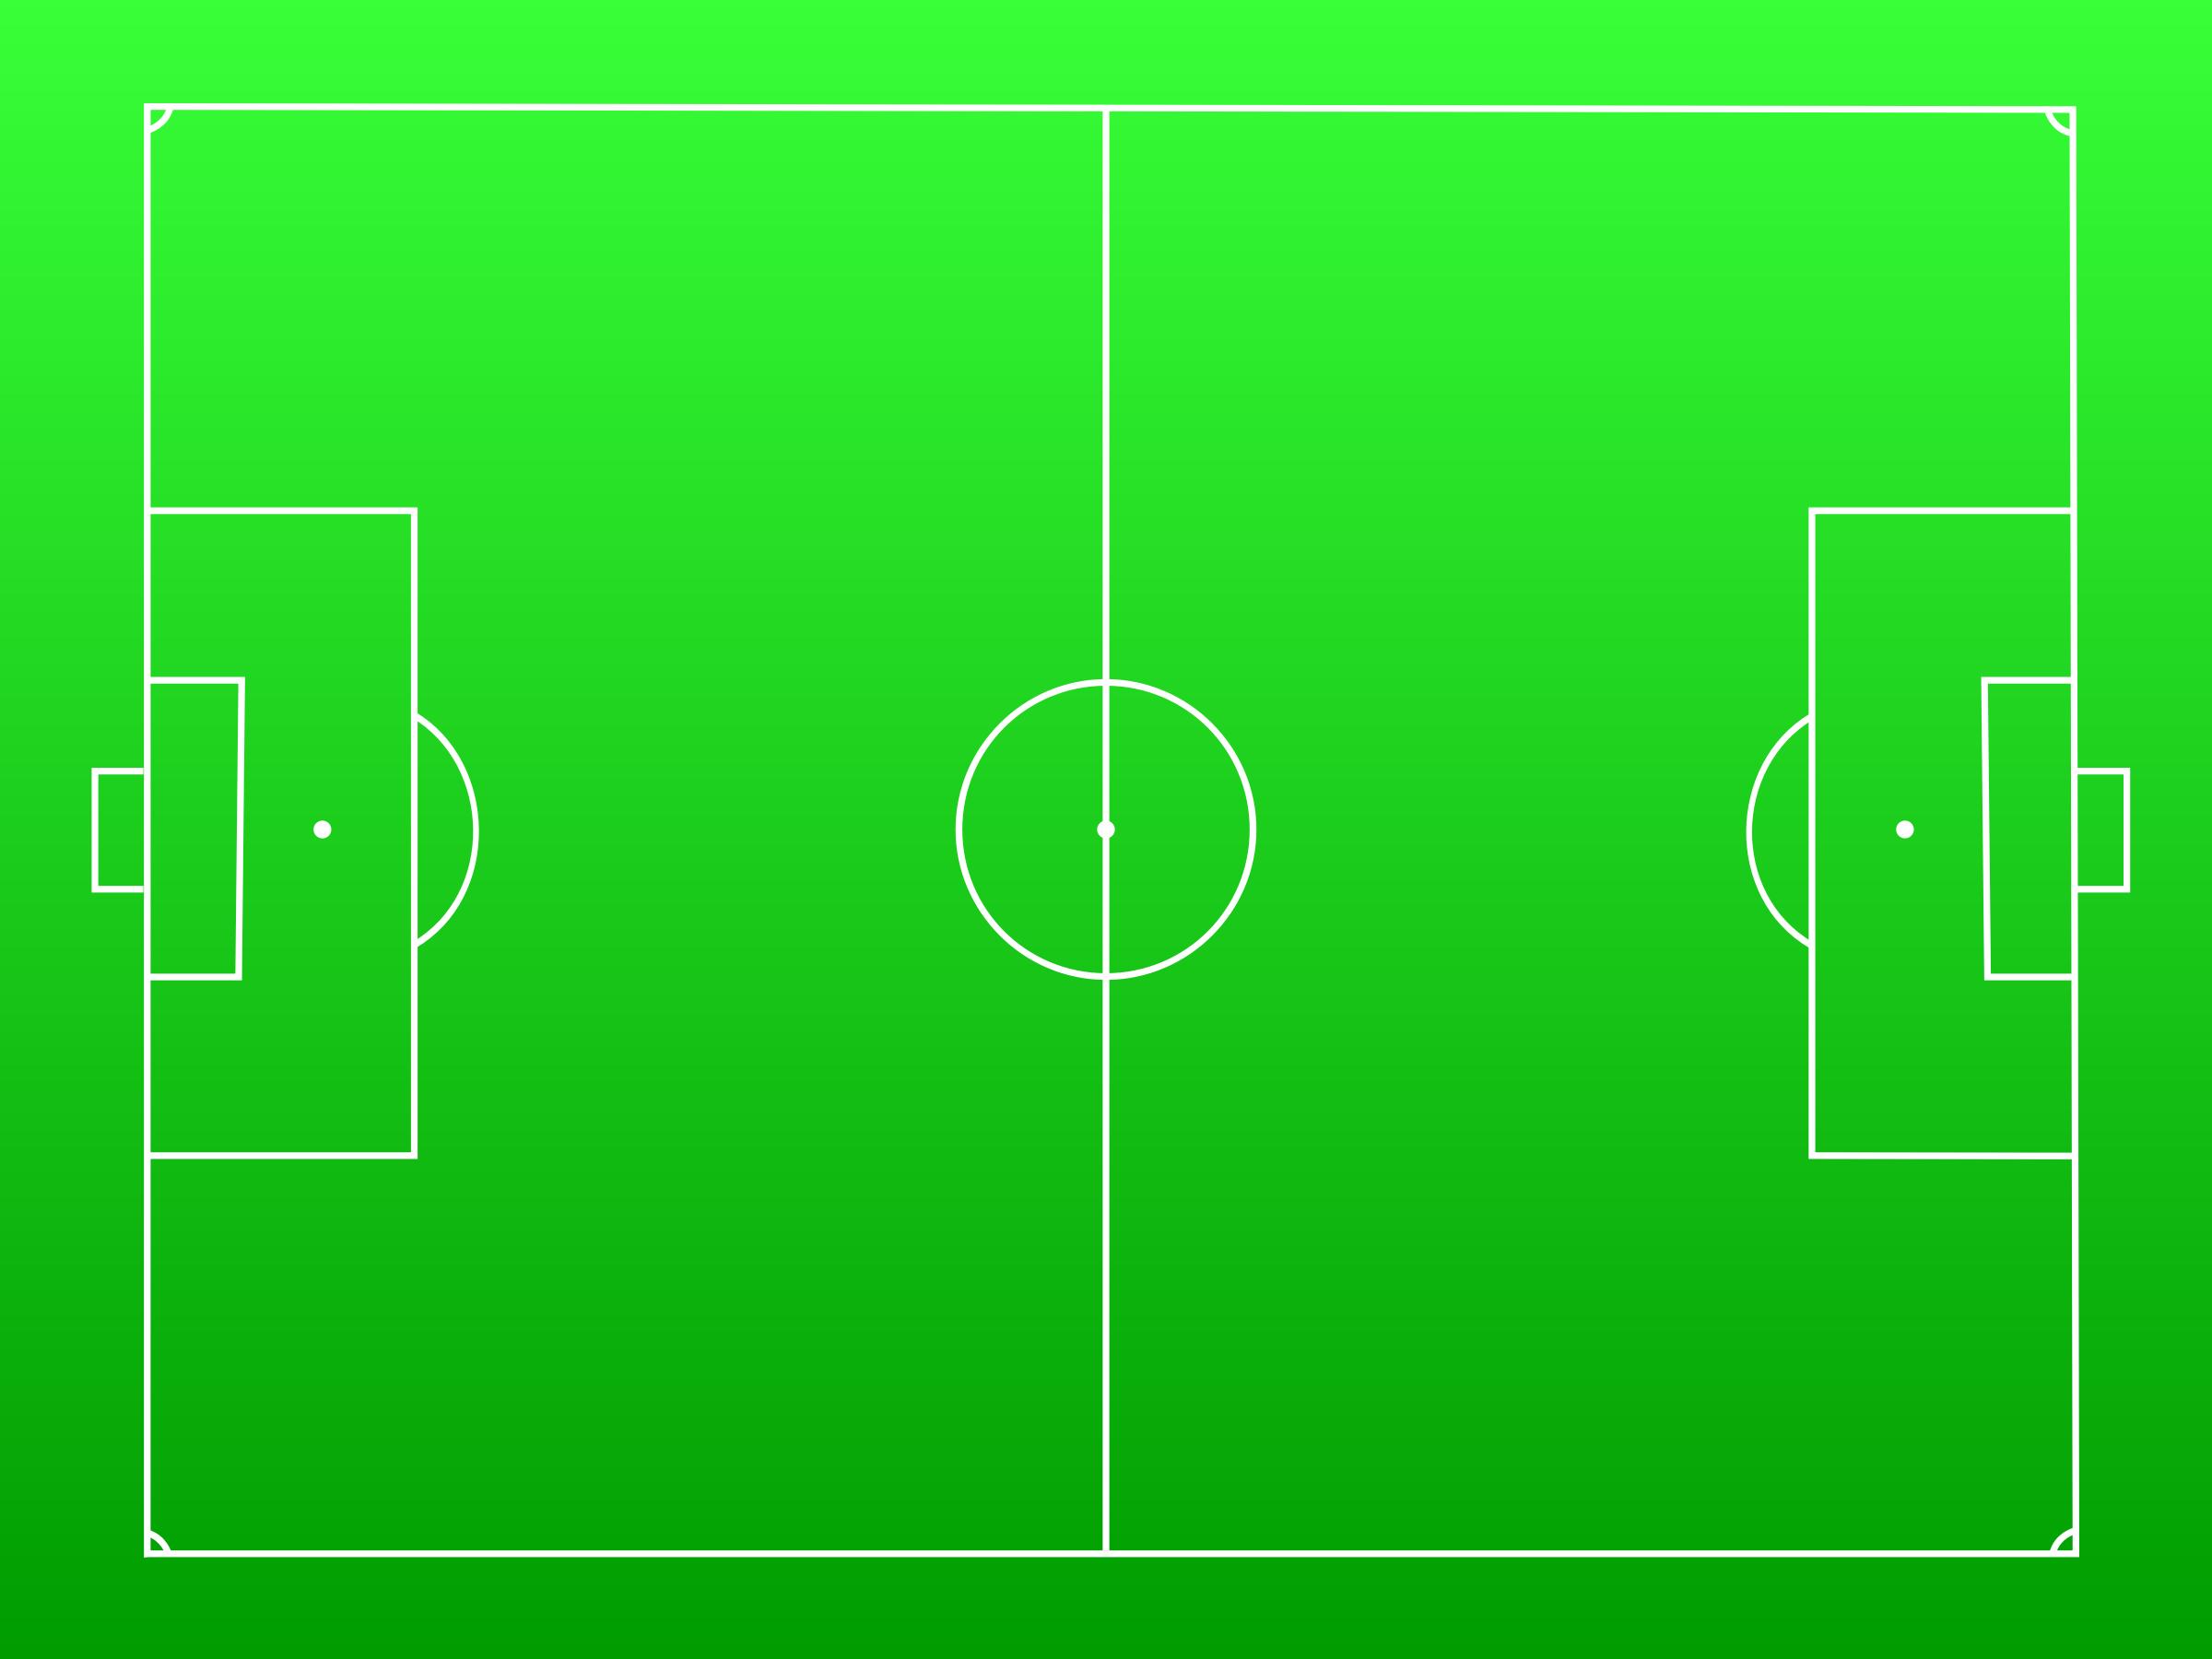 Football Field Green Clip Art Drawing Free Image